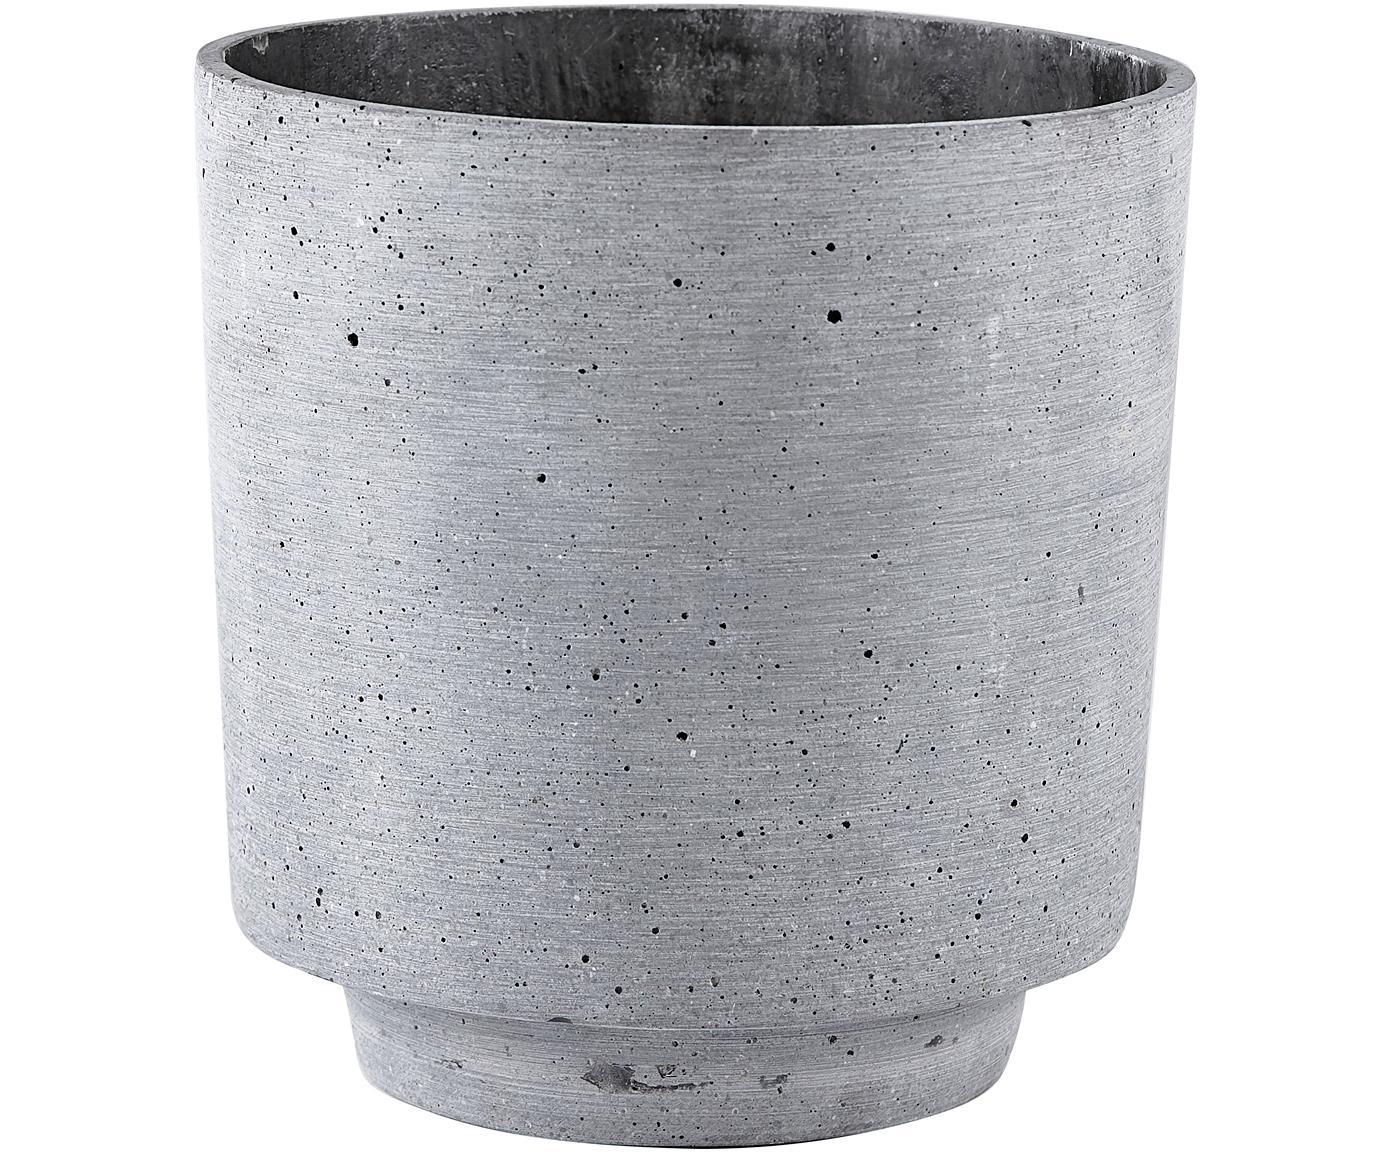 Übertopf Pola, Kunstfaser, Grau, Ø 19 x H 19 cm